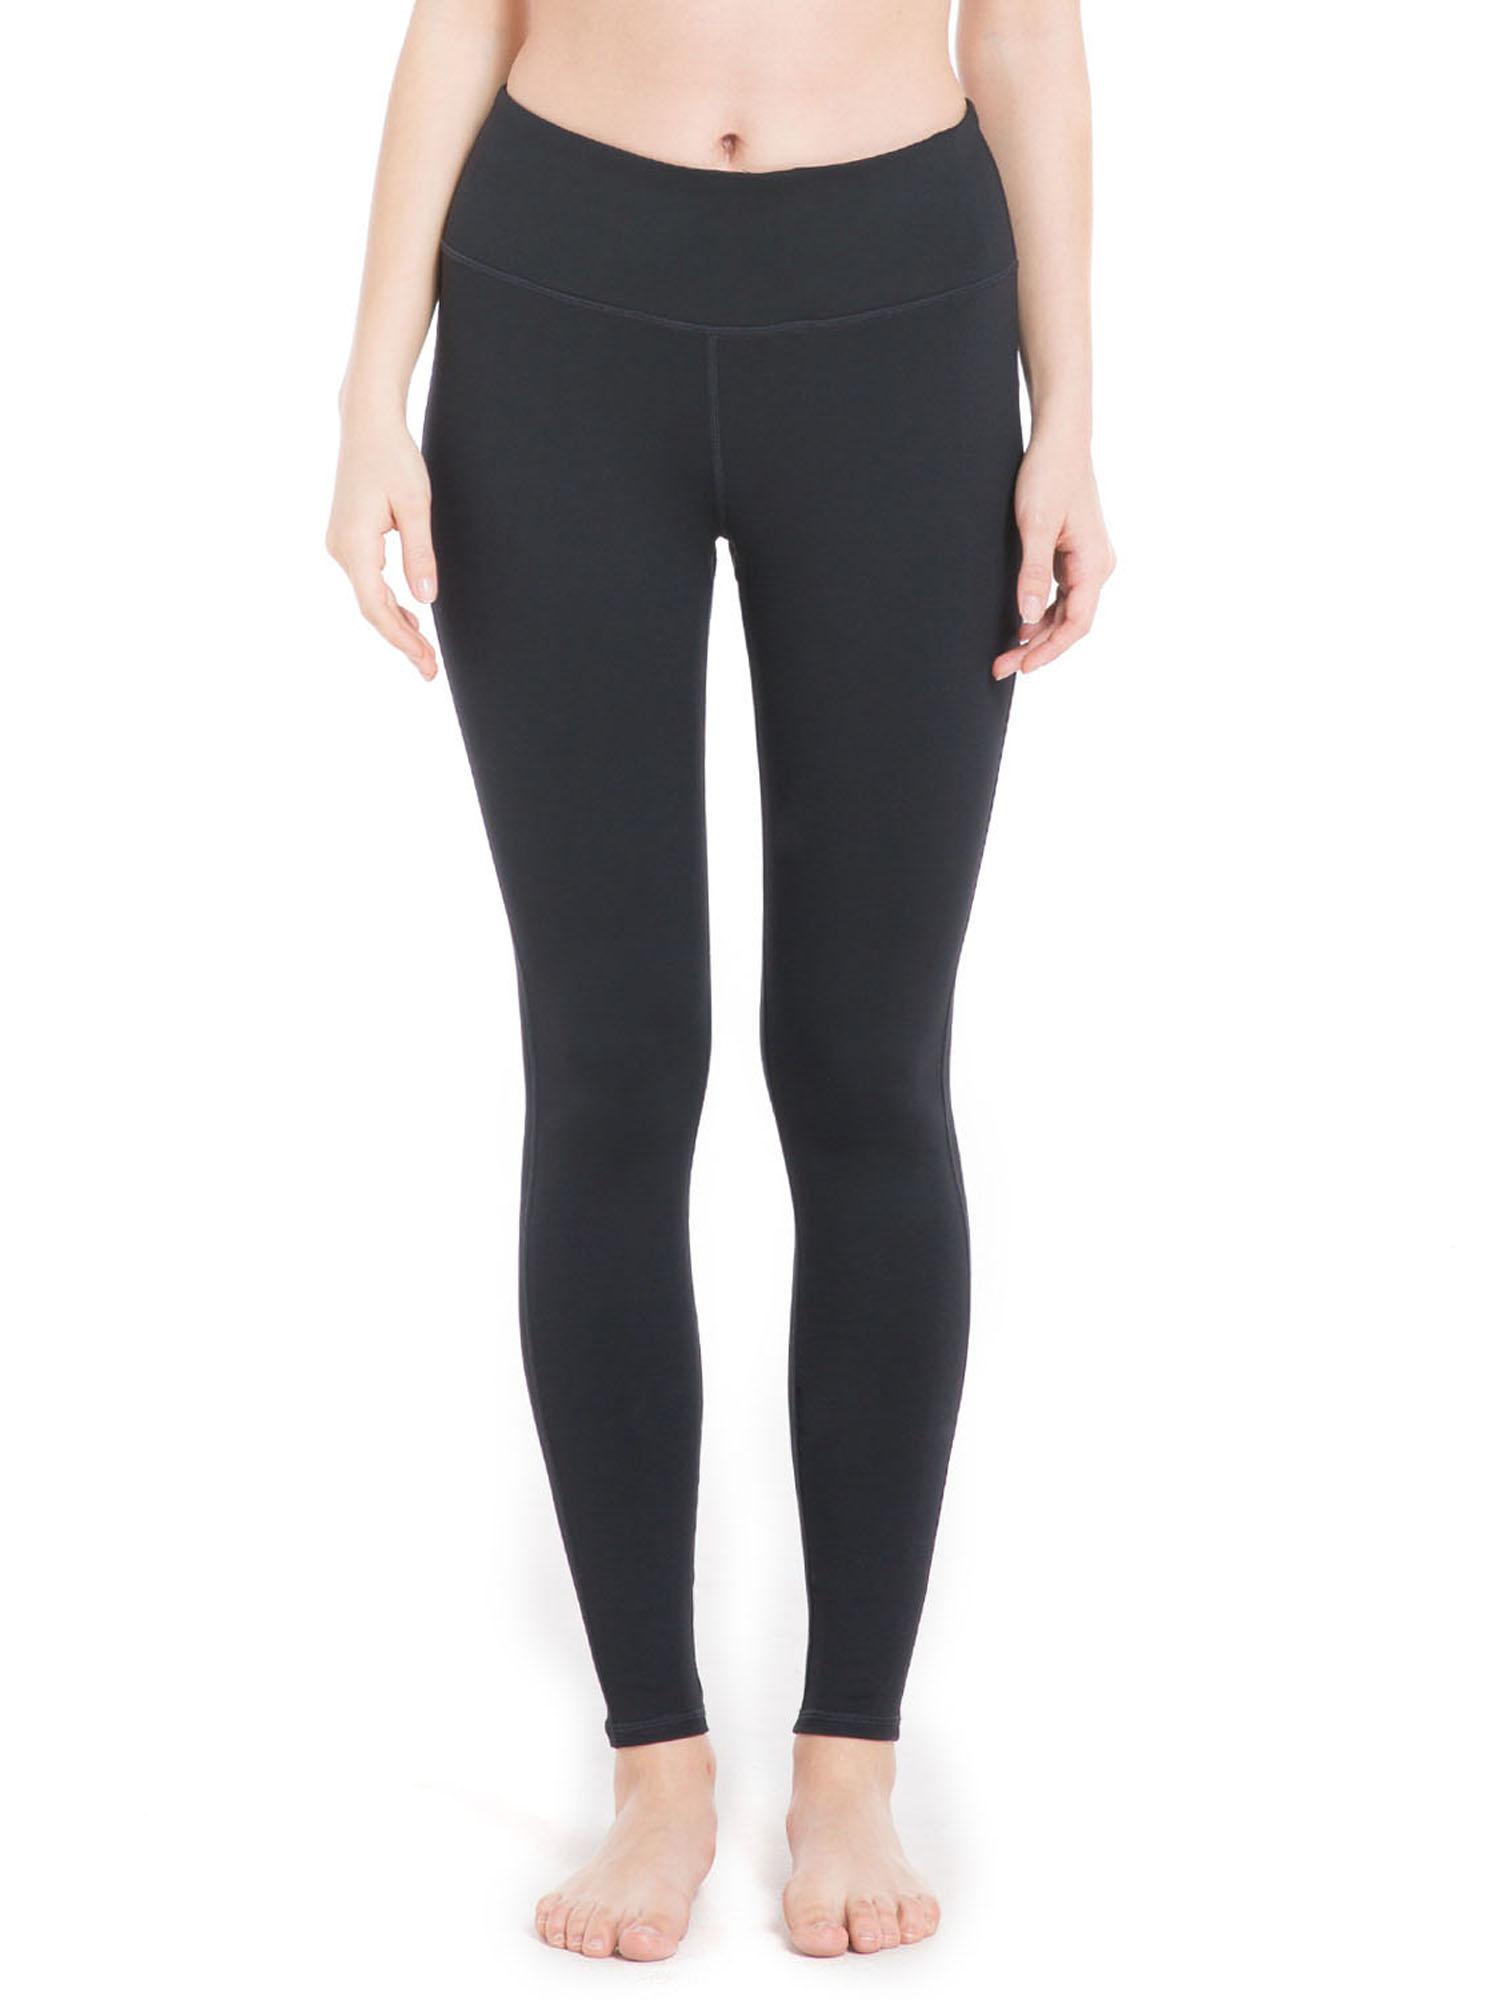 OwnShoe Women Yoga Pants High Waist Out Pockets Elasticity Tummy Control Running Tights Nine Pants